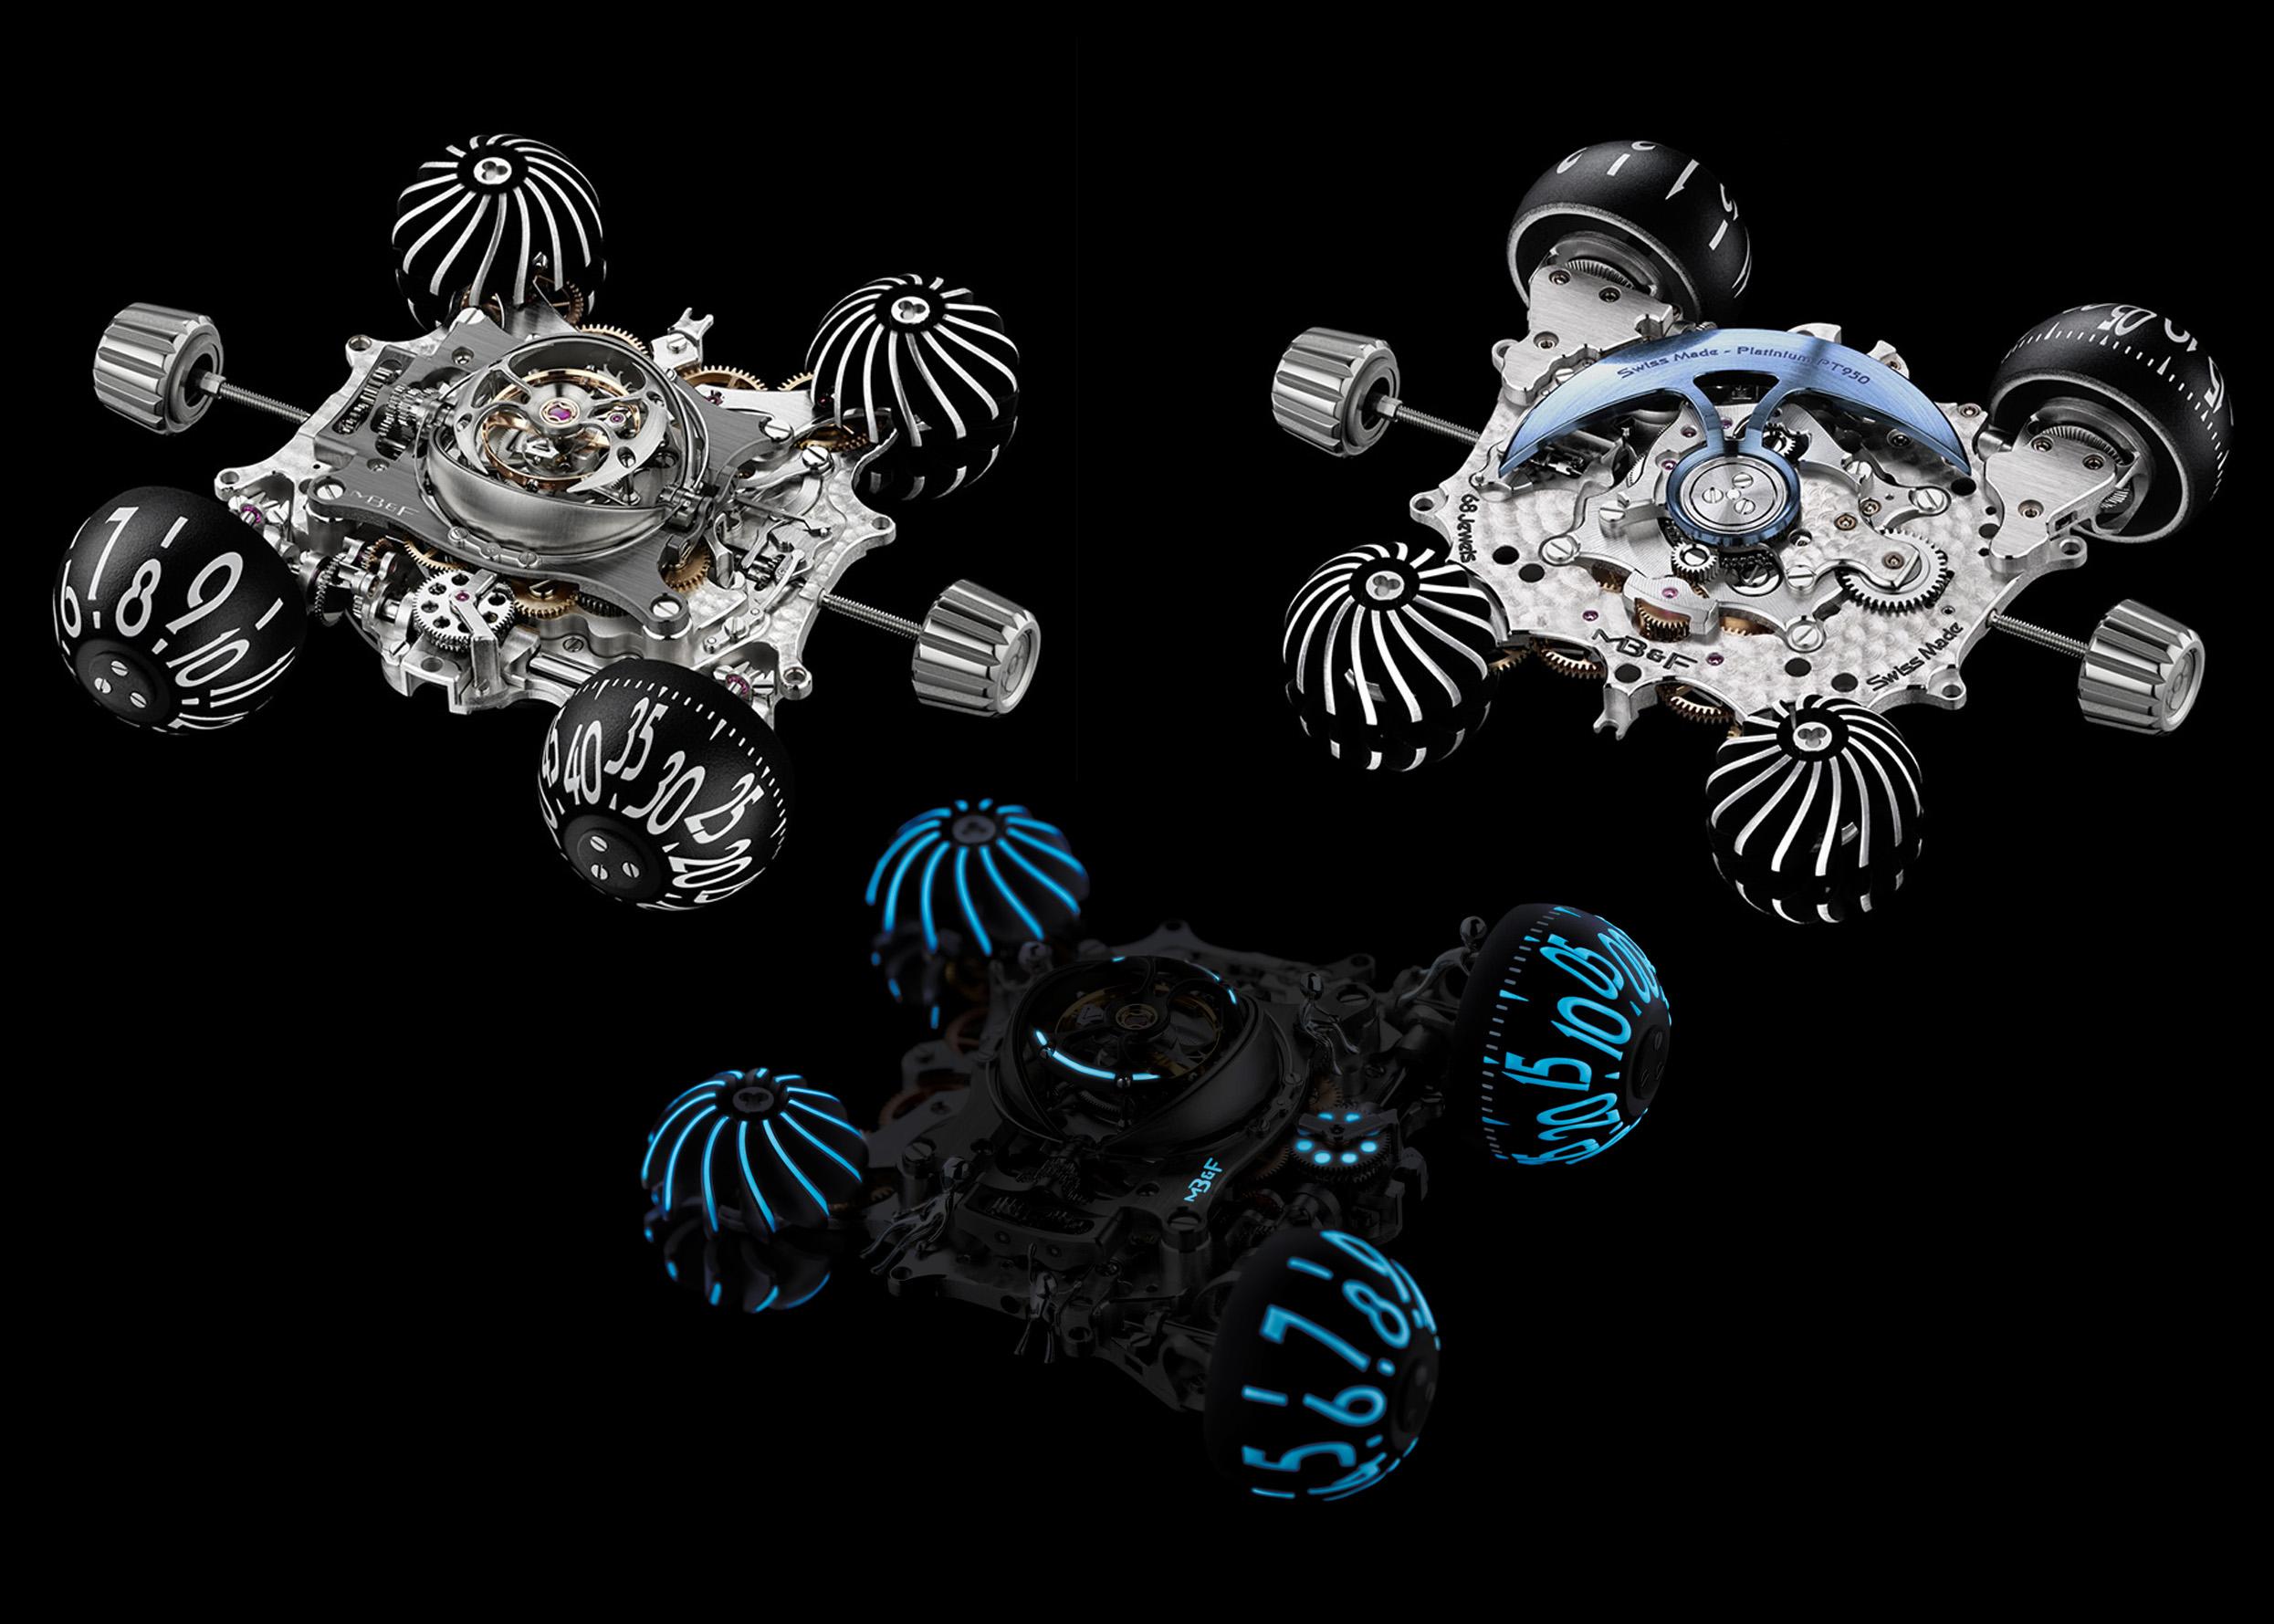 MB&F HM6 motor